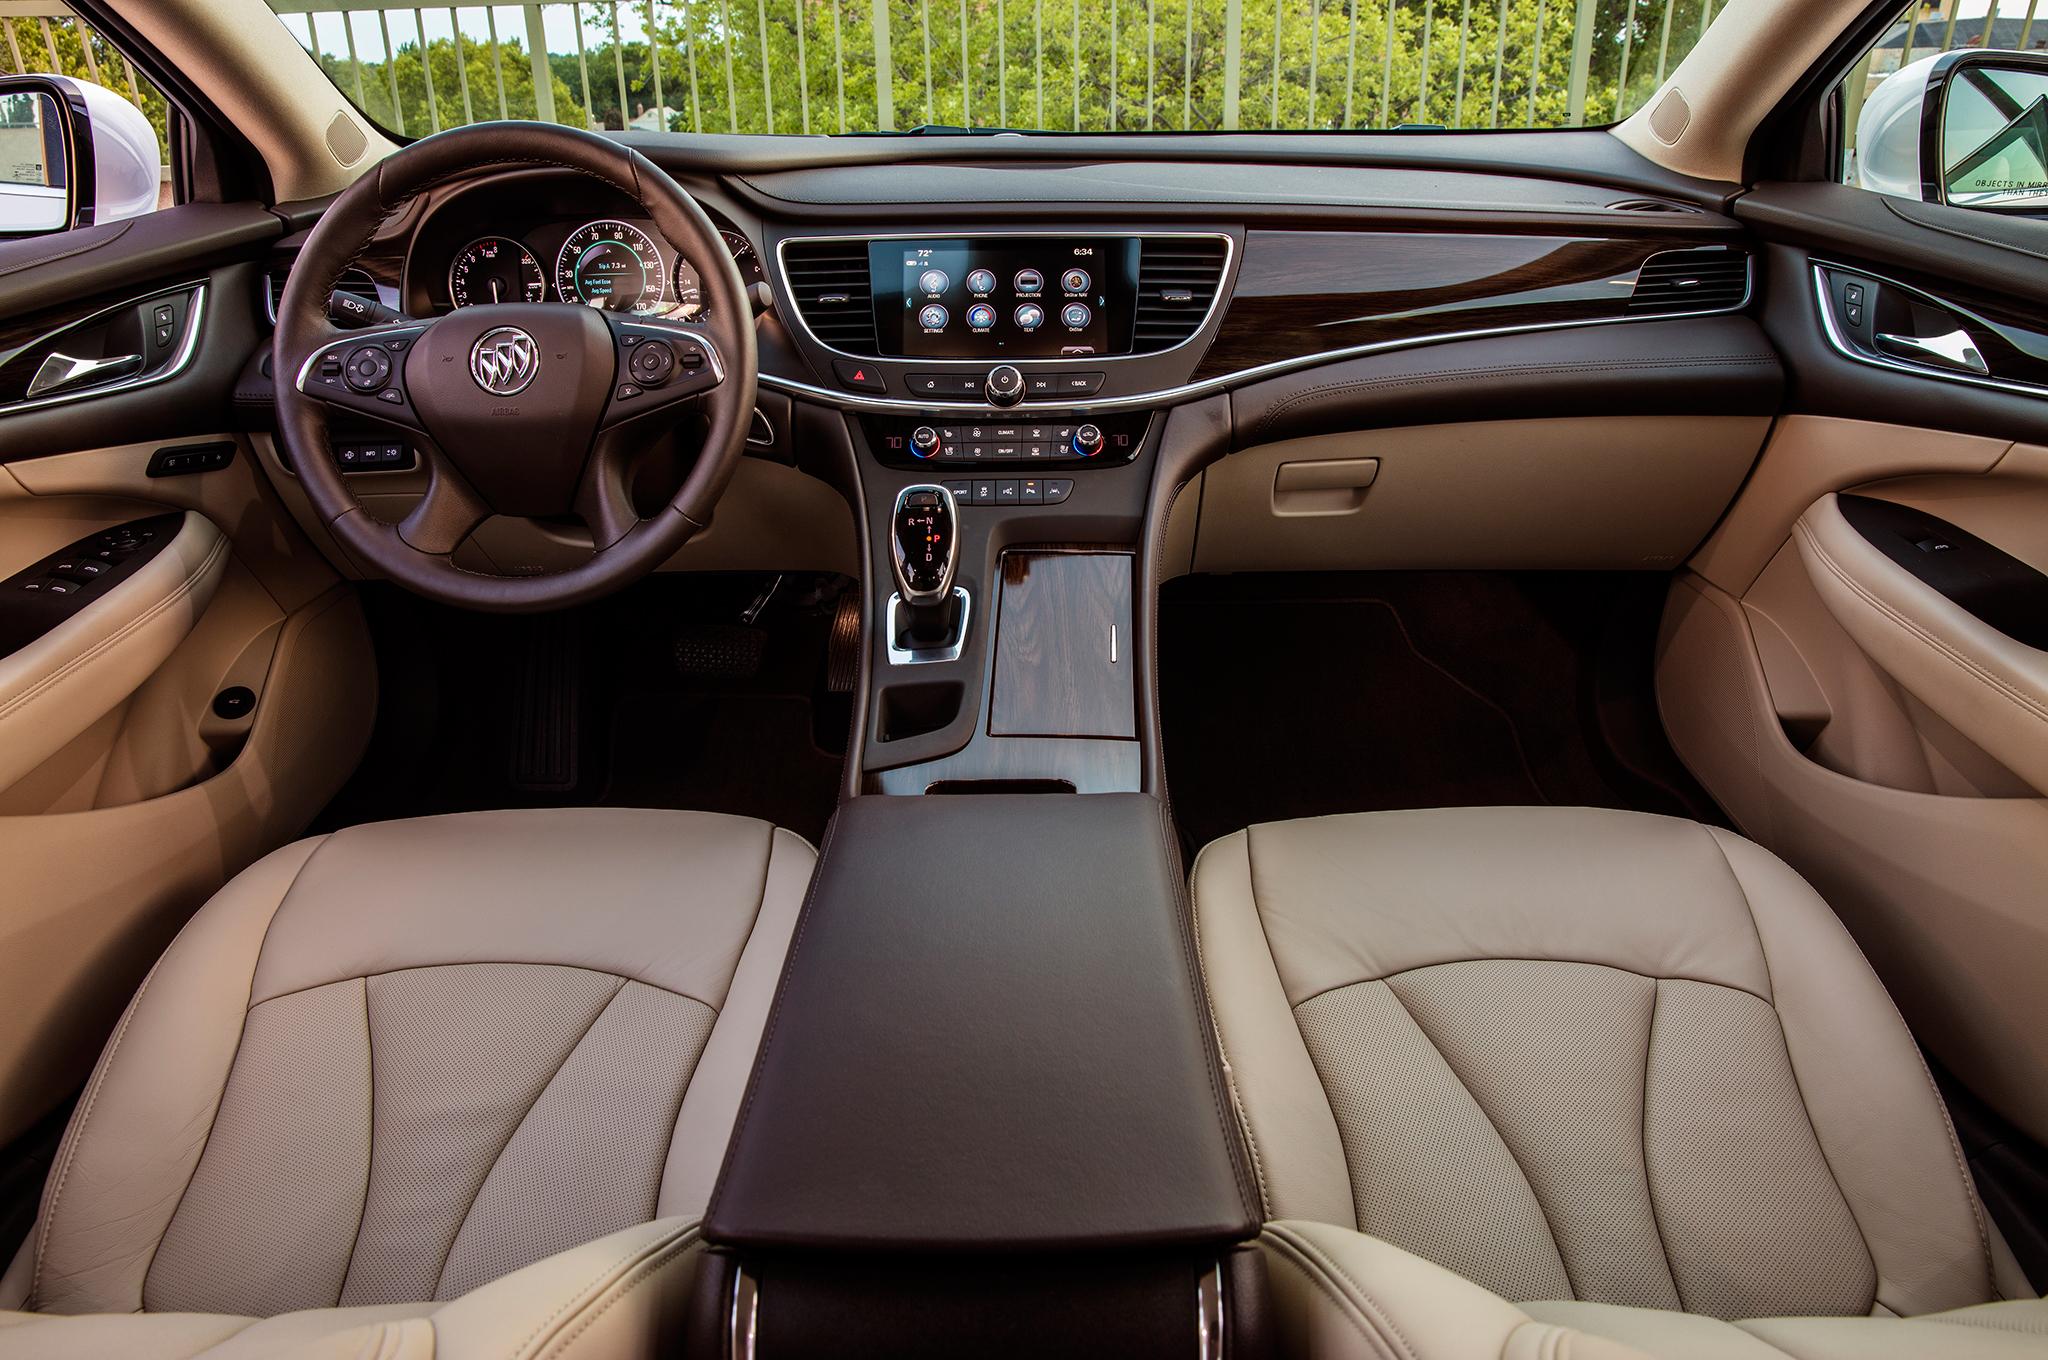 Buick LaCrosse 2017 Interior